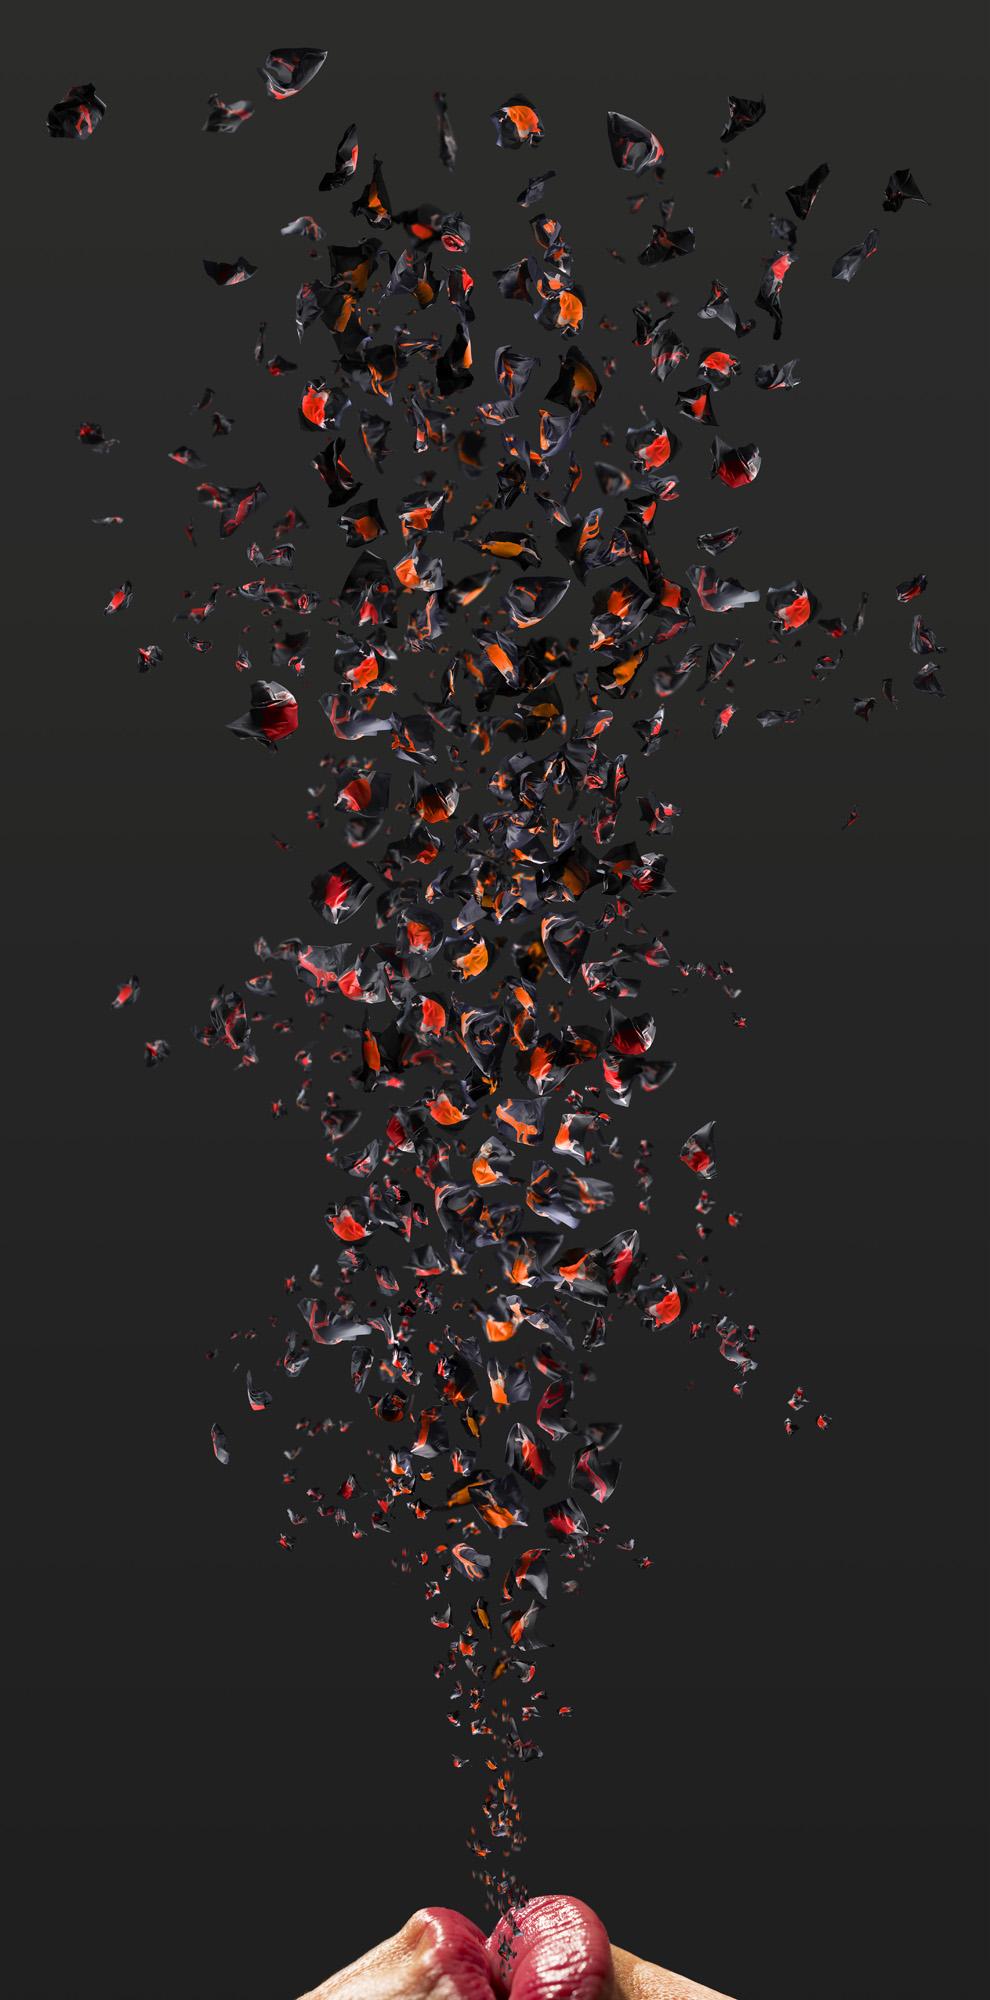 JULIE RRAP   Remaking the World #2  2015 Pigment print on paper on aluminium 200 x 100 cm